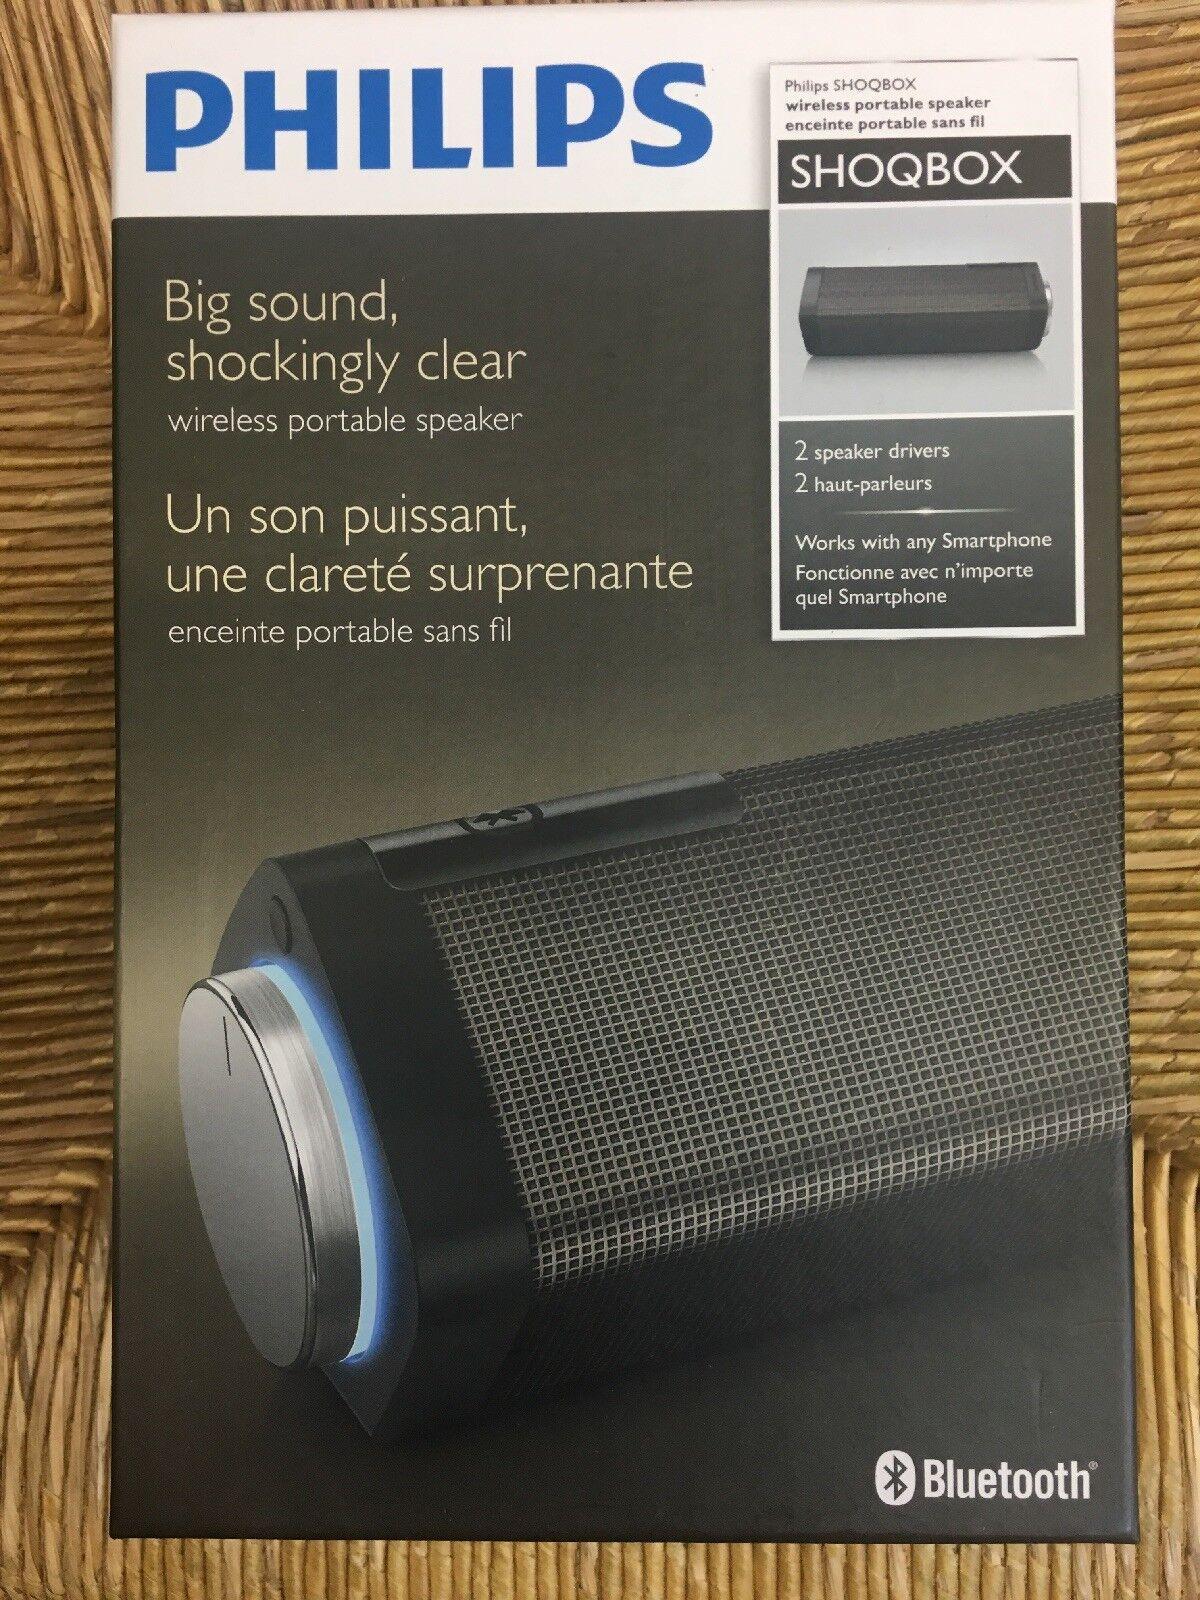 Philips SHOQBOX Wireless Portable Bluetooth Speaker New in B